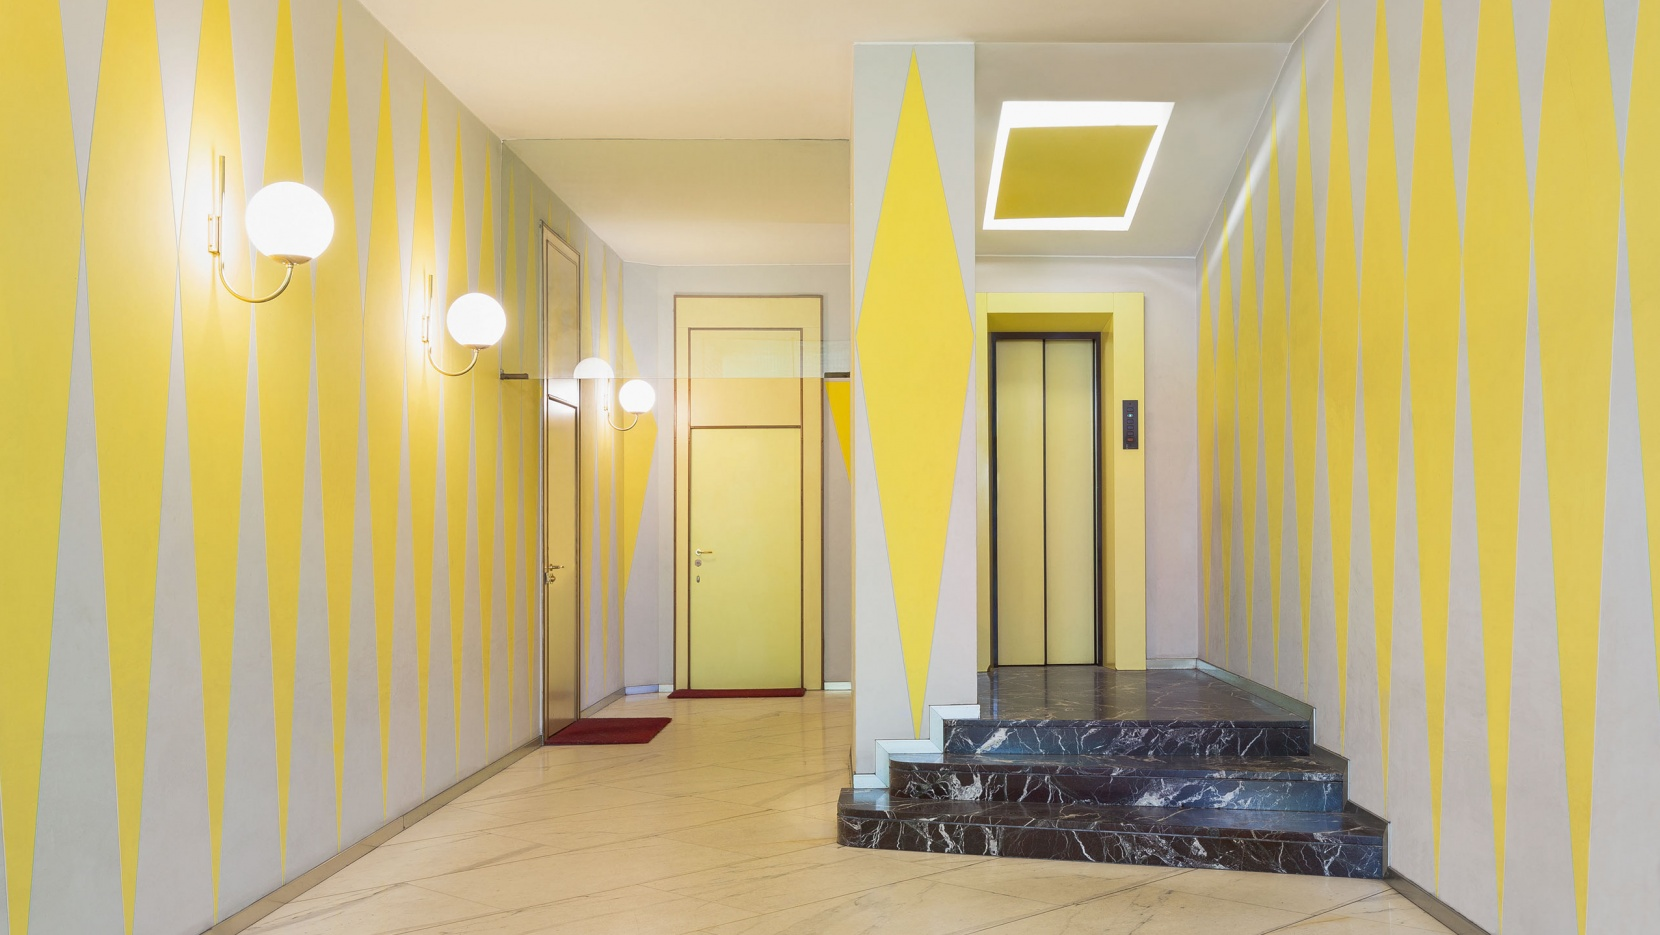 Making An Entrance A Visual Tour Of Milan S Splendid Entryways By Karl Kolbitz Yatzer